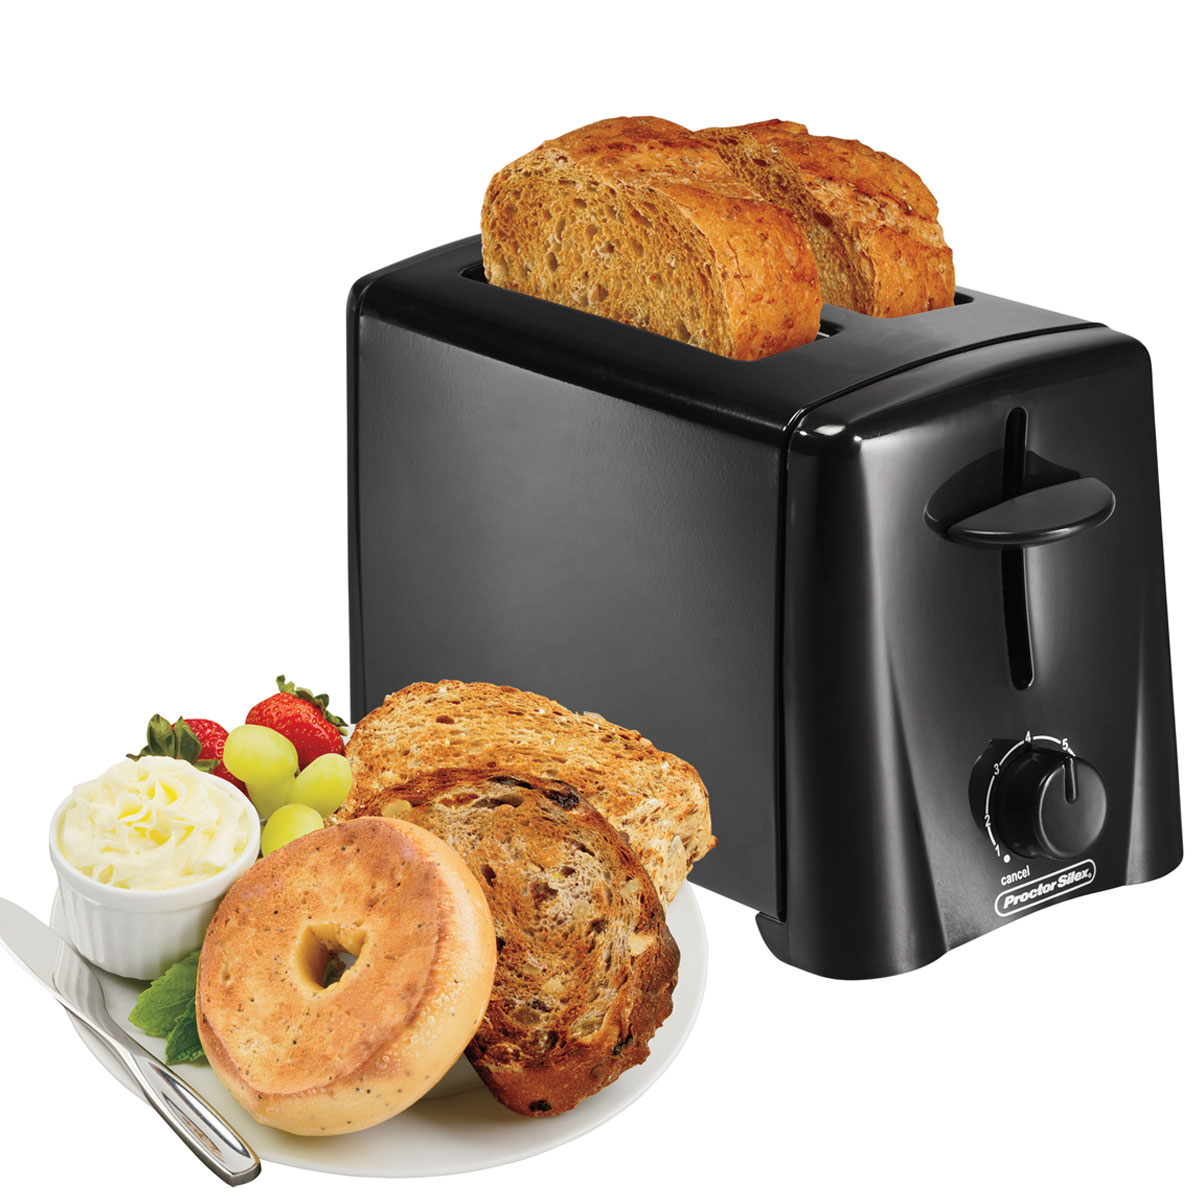 Proctor Silex Commercial 22612 2 Slice Toaster Black 2 Per